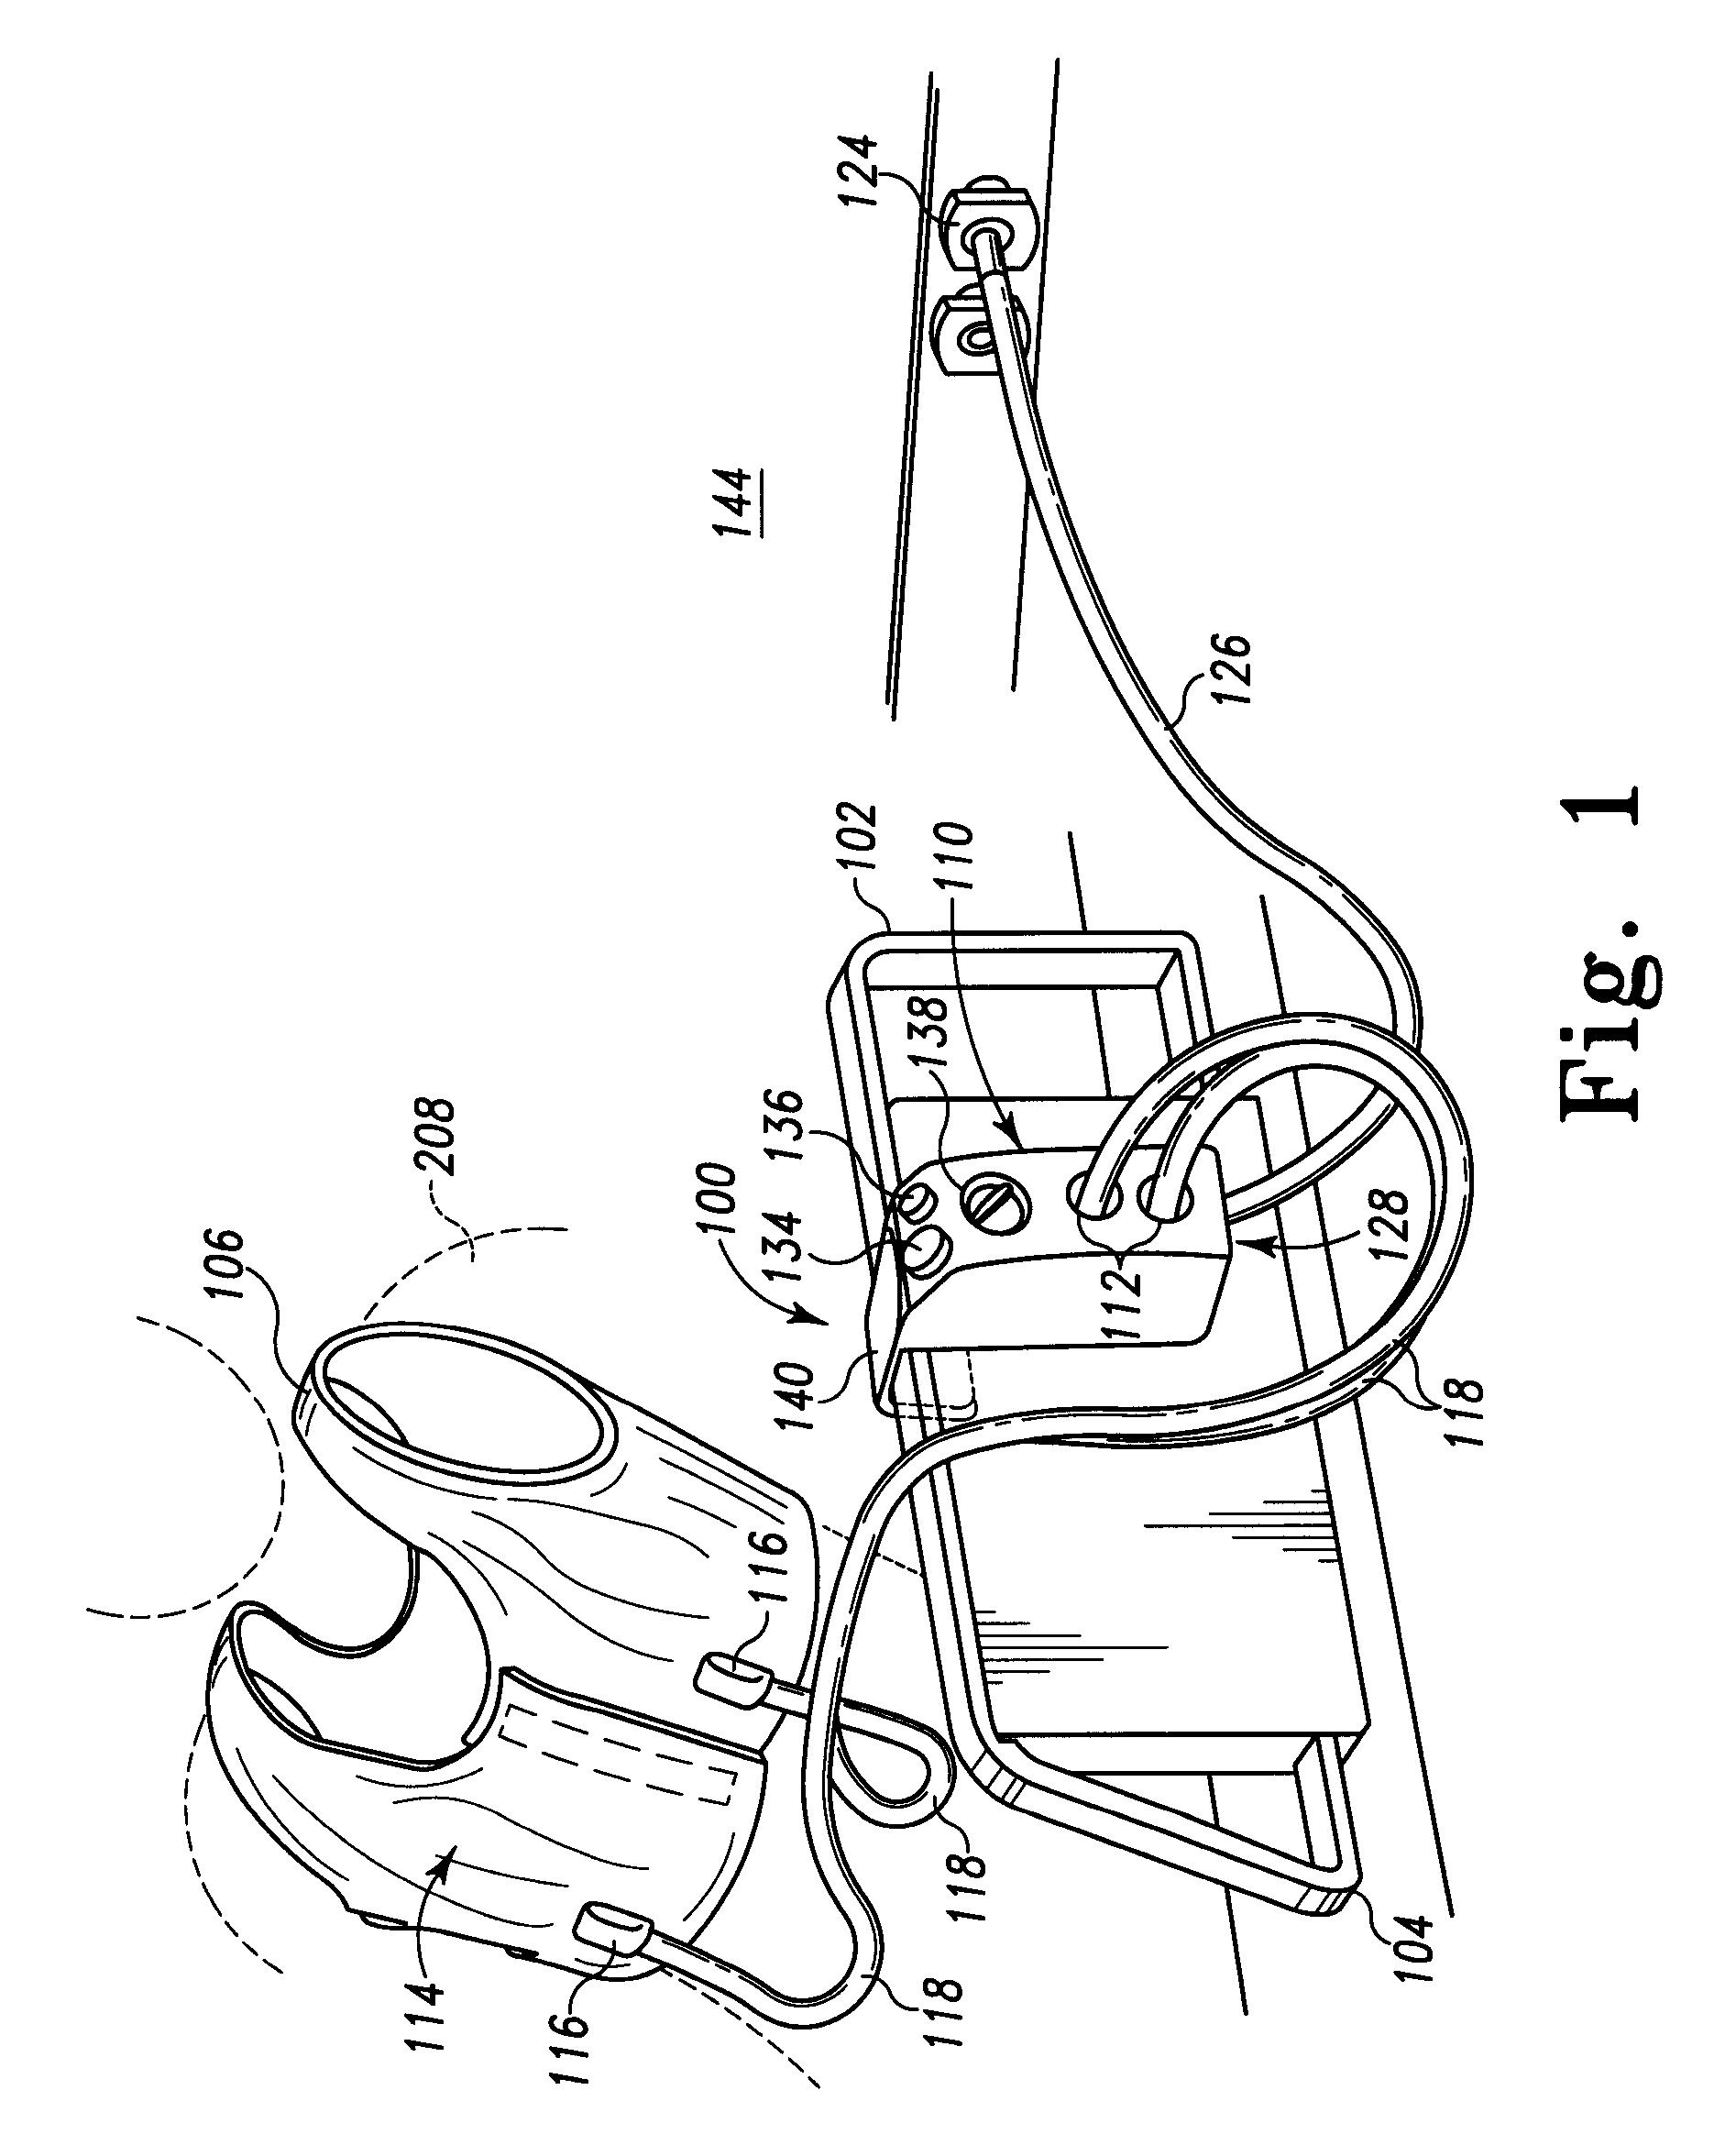 mitsubishi pin alternator wiring diagram mitsubishi discover ford pinto transmission diagram